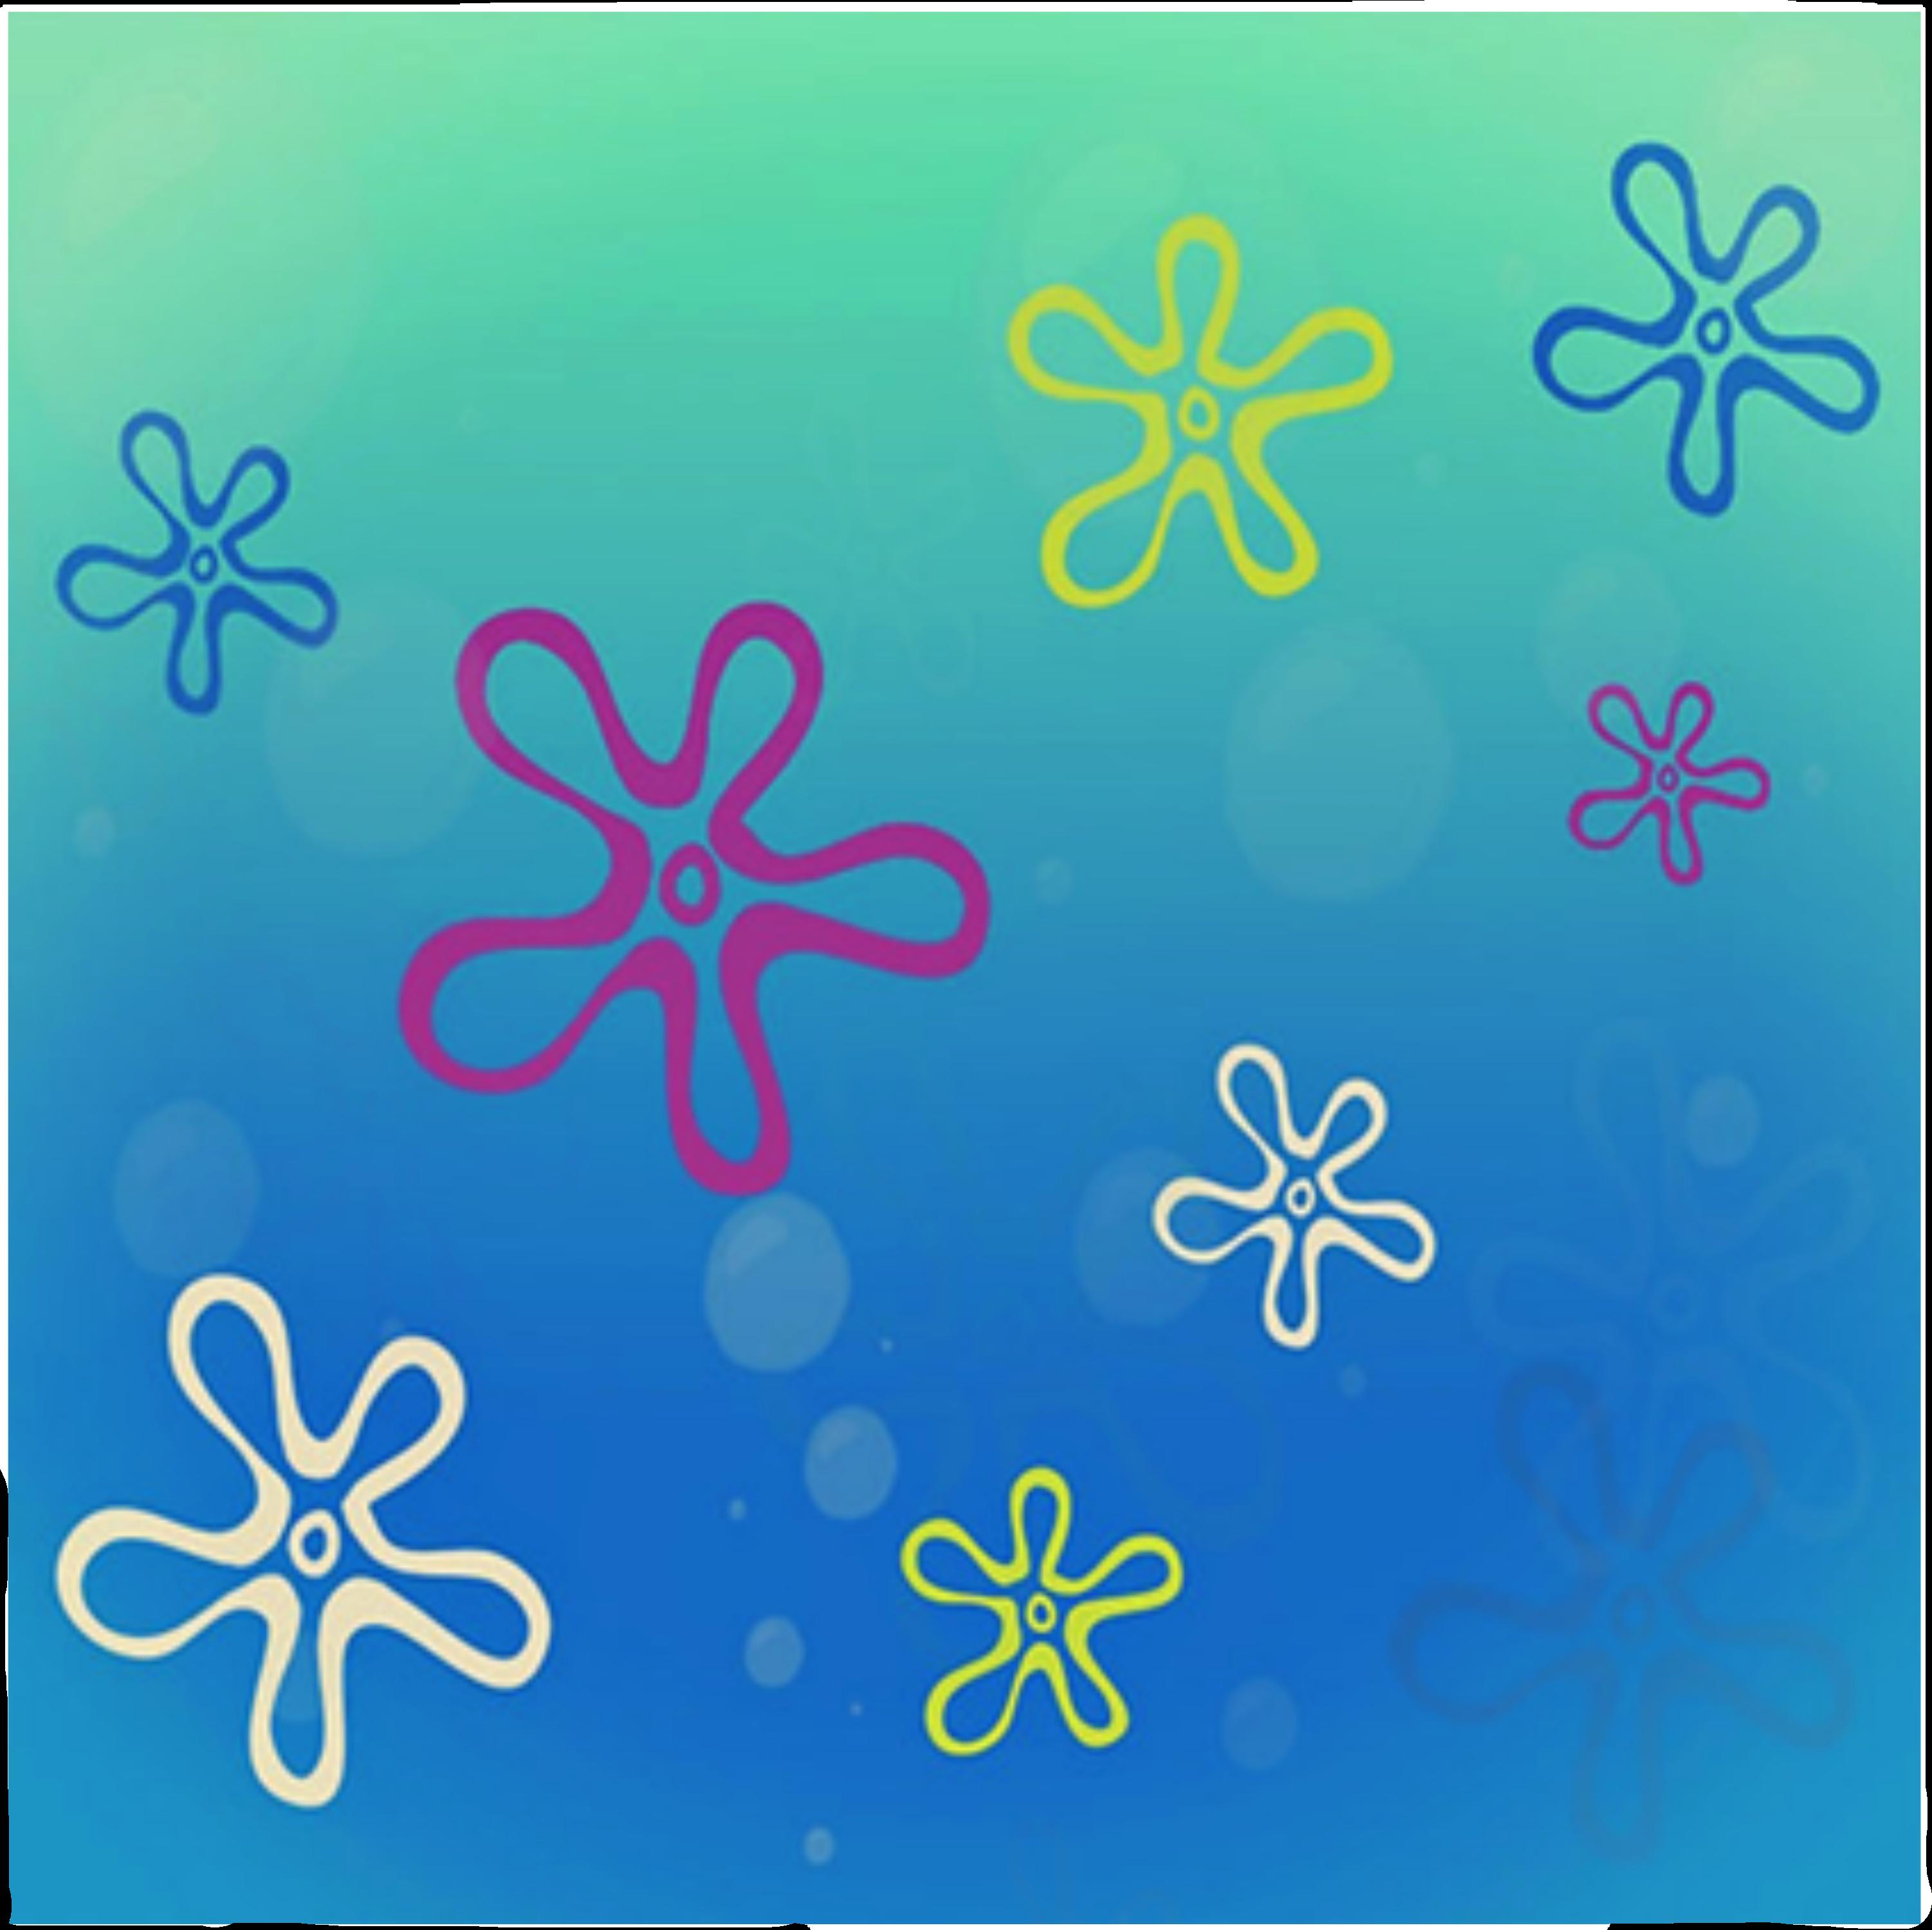 Underthesea Spongebob Spongebobsquarepants Spongbob Bikinibottom Underthewater Bobes Iphone Wallpaper Glitter Iphone Wallpaper Fall Spongebob Background